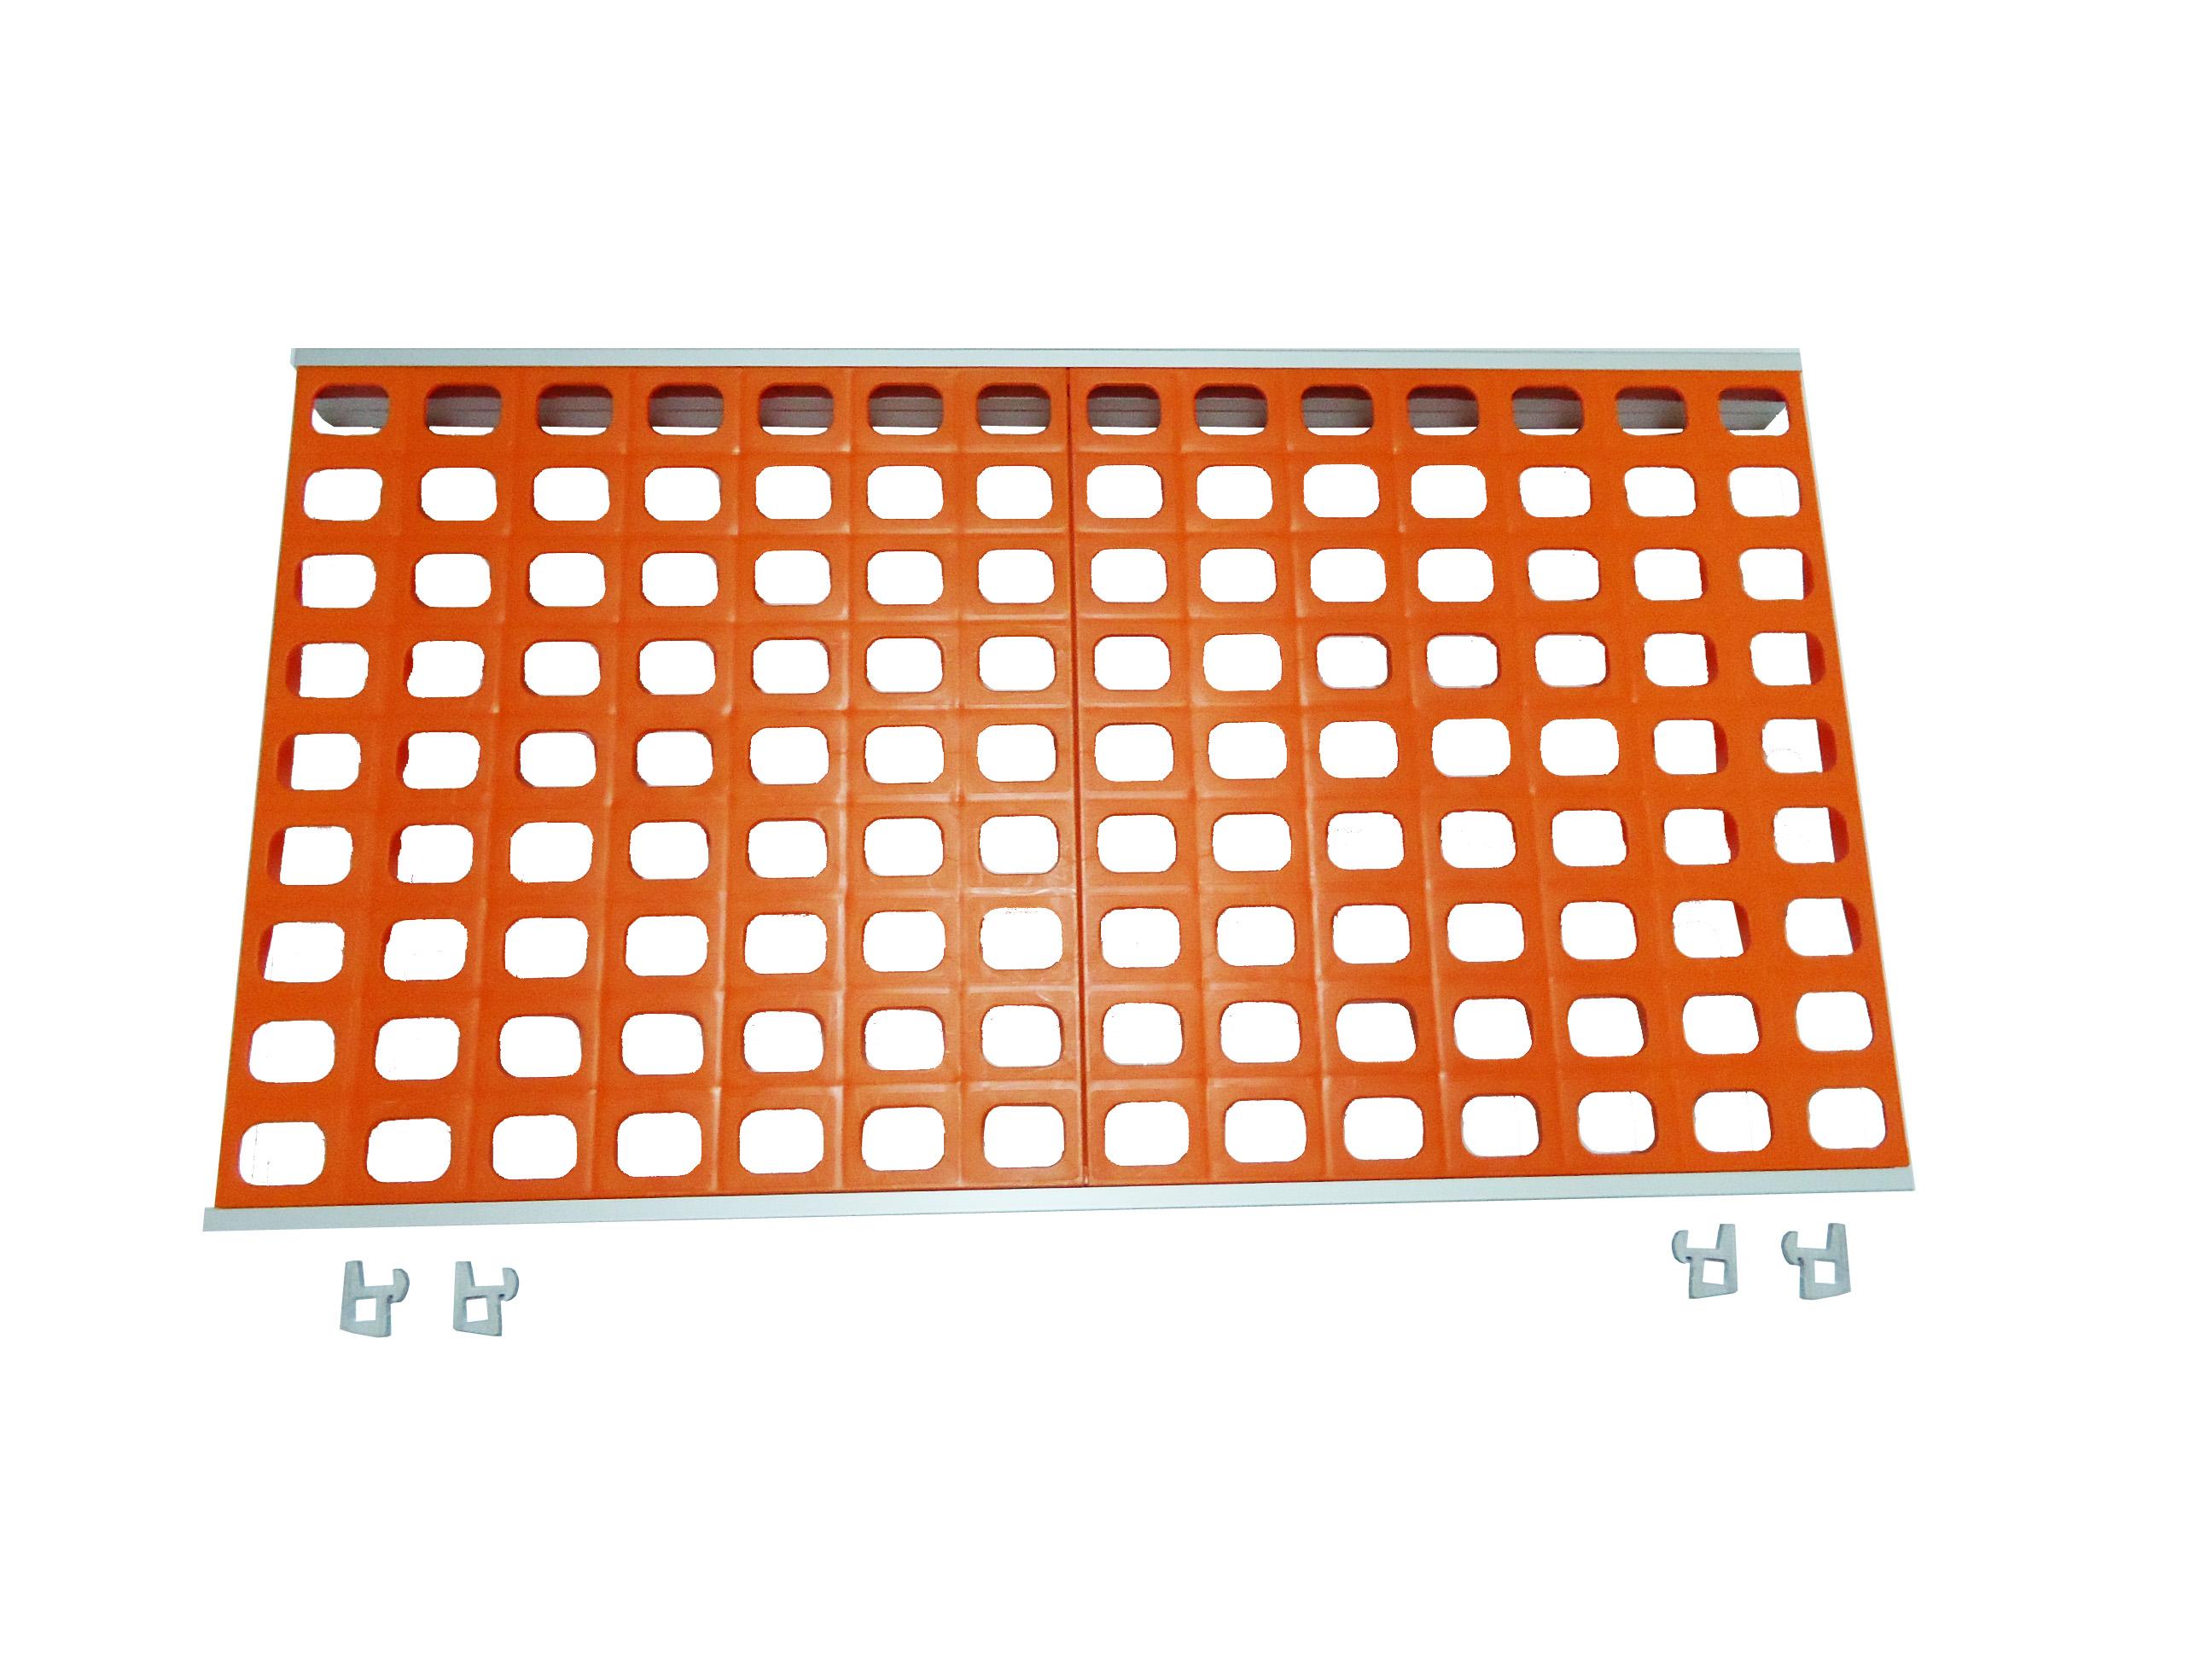 Coolblok KOPA4765C Ραφιέρα - Ράφι Ψυκτικών Θαλάμων Μονό Πολυαιθυλενίου - 650x470 ψυκτικοί θάλαμοι    ράφια ψυκτικών θαλάμων  ψυκτικοί θάλαμοι    ράφια ψυκτικών θ